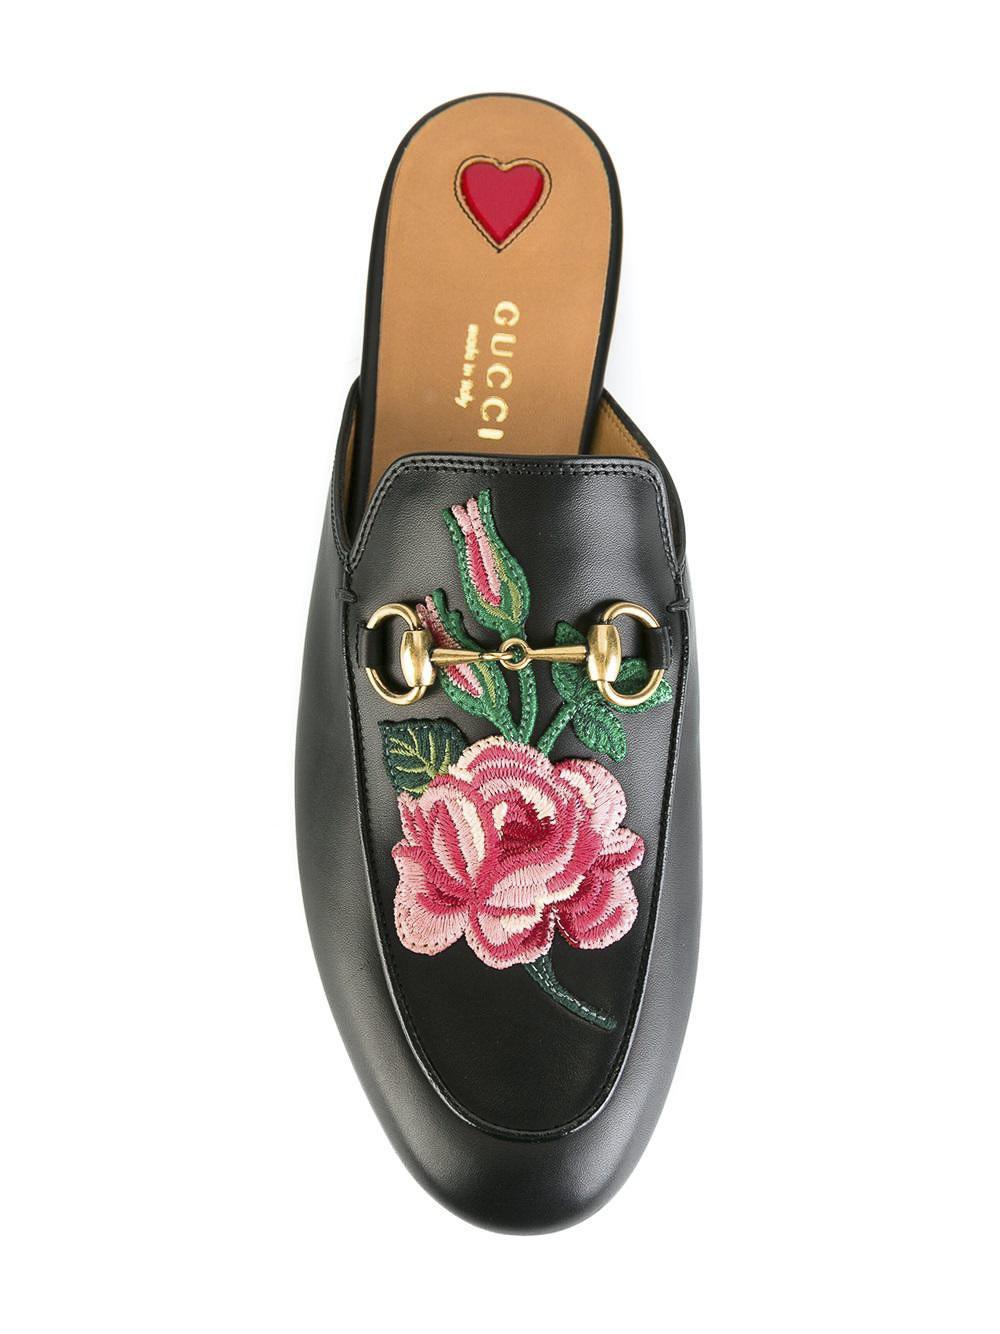 dec6160fd0b9 Lyst - Gucci Flower Patch Slippers